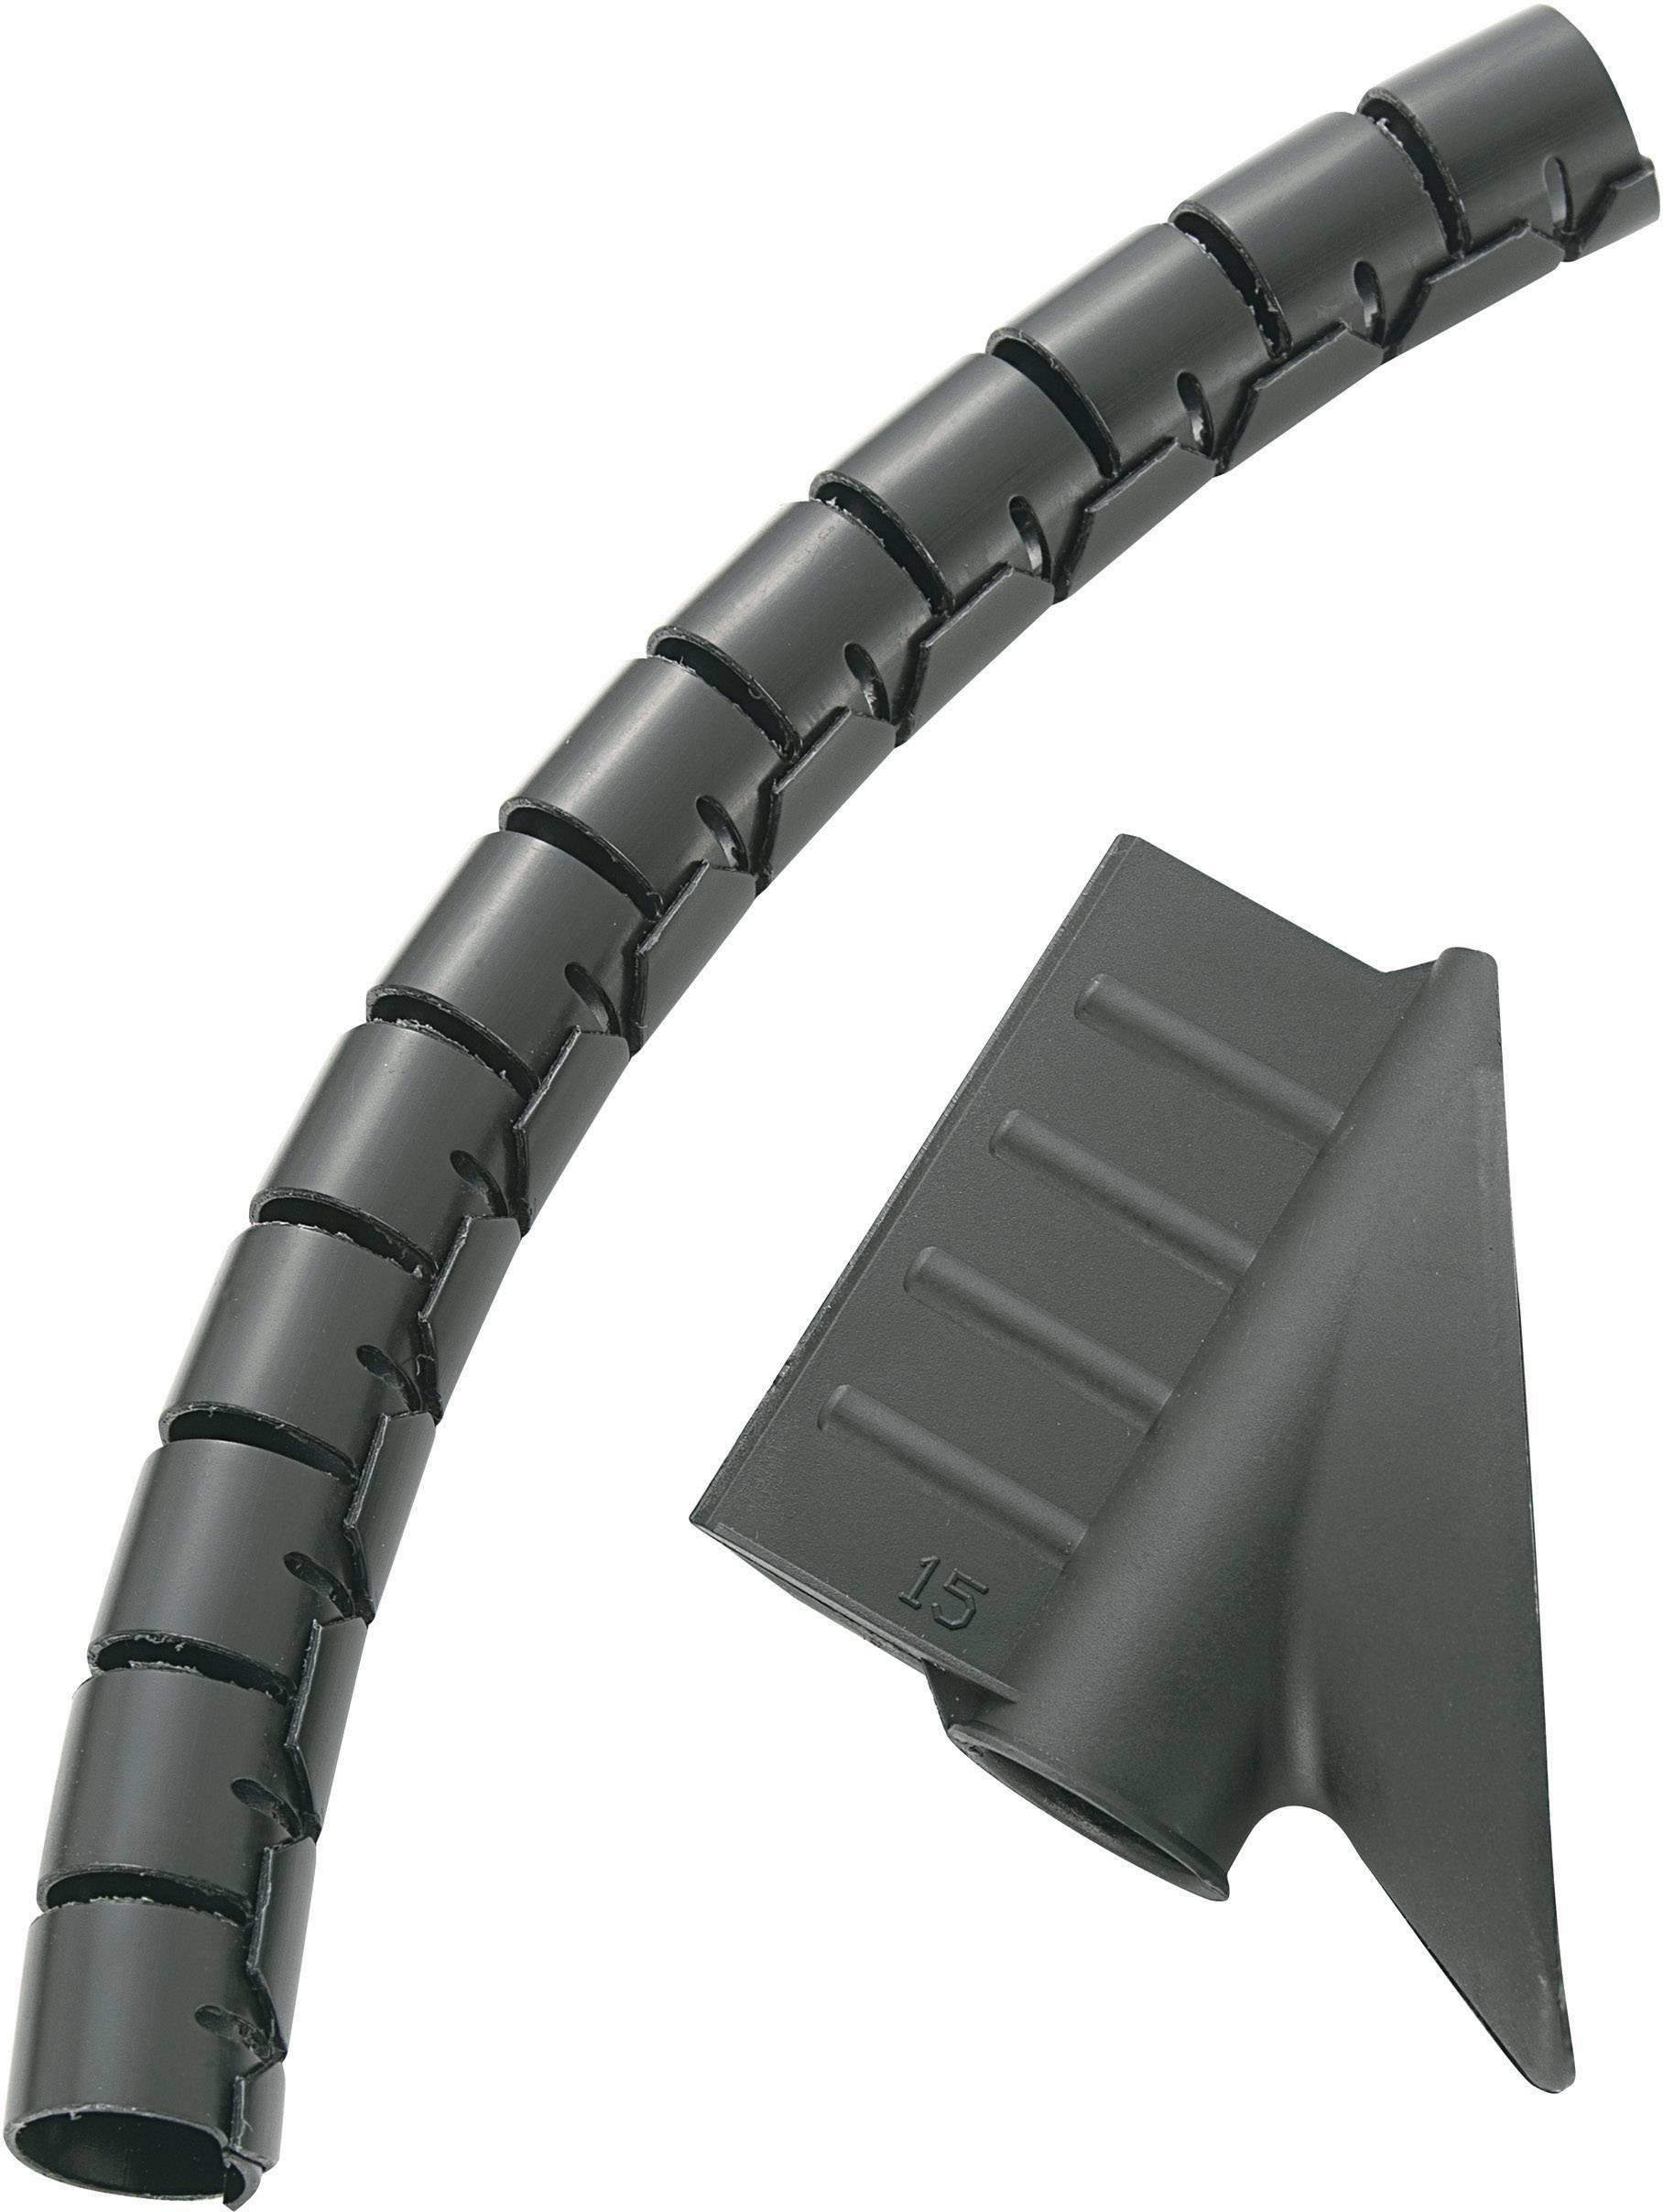 Spirálová trubice na kabely KSS MX-KLT20GY (28530c1023), 20 mm, šedá